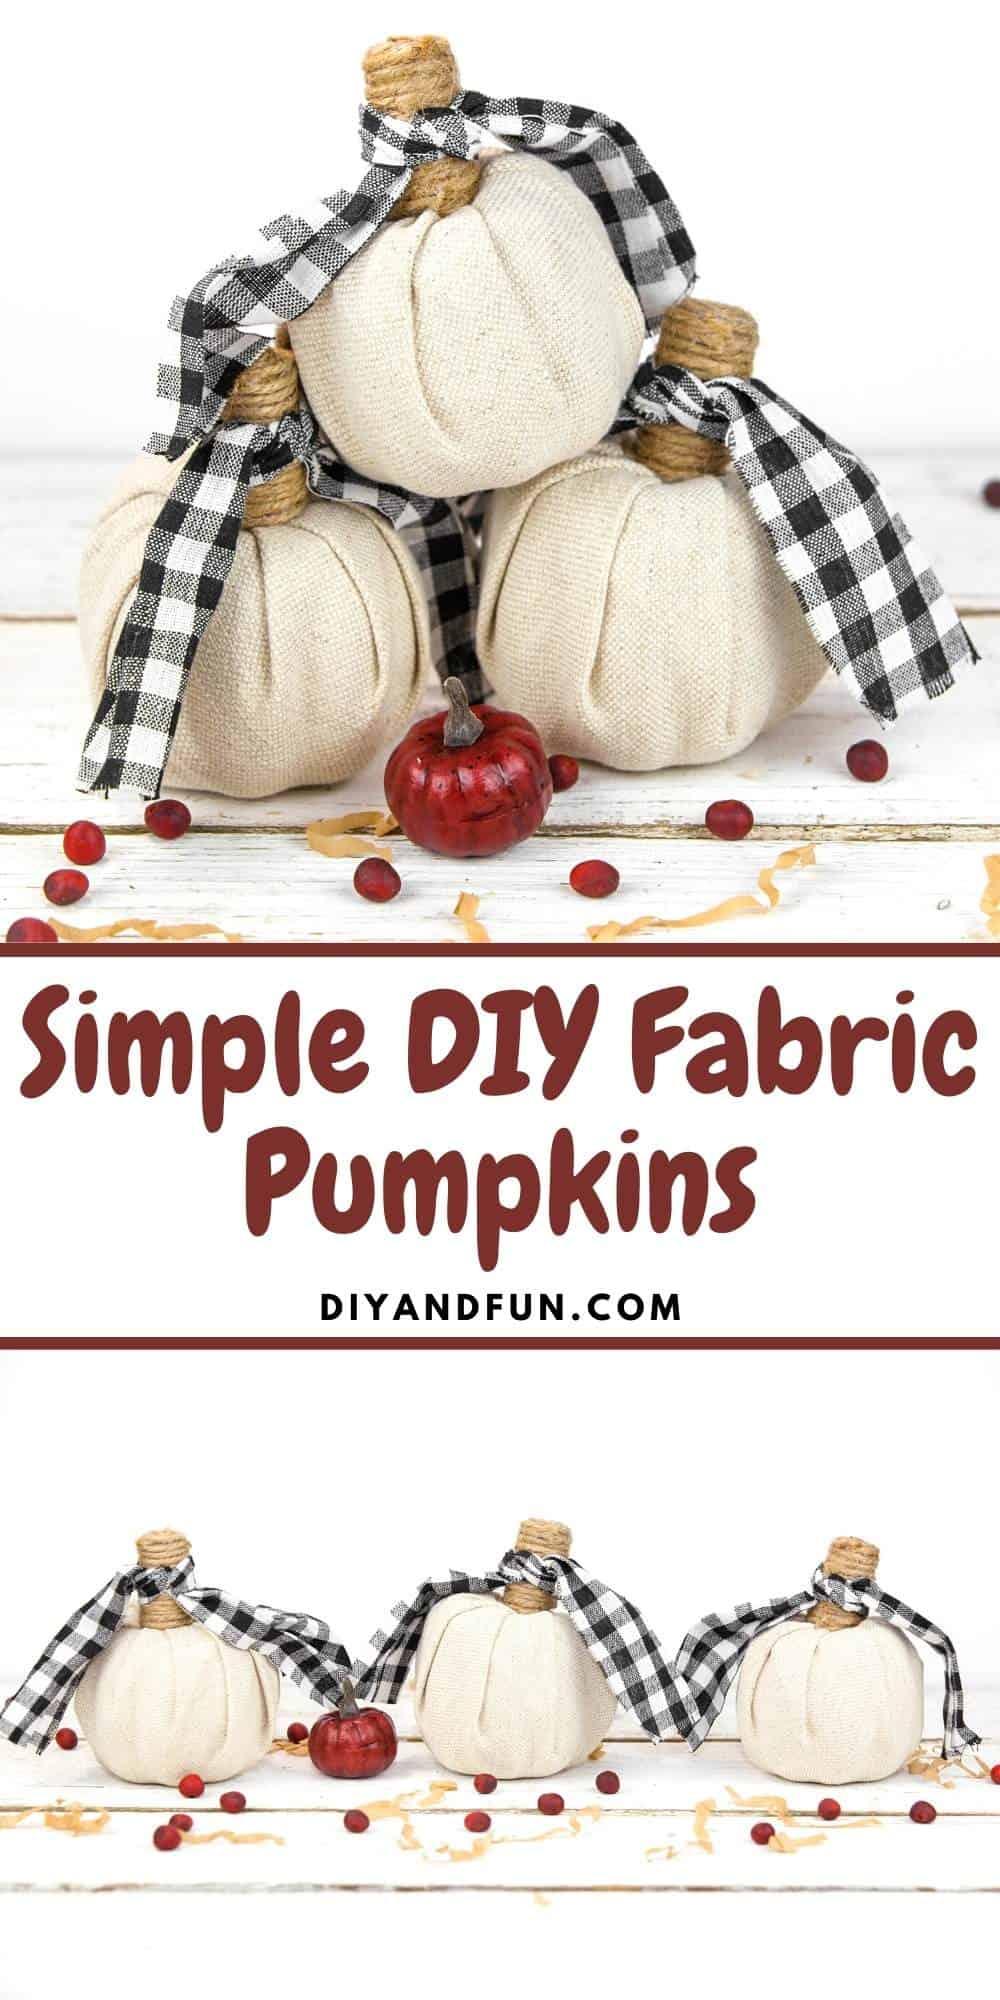 Simple DIY Fabric Pumpkin